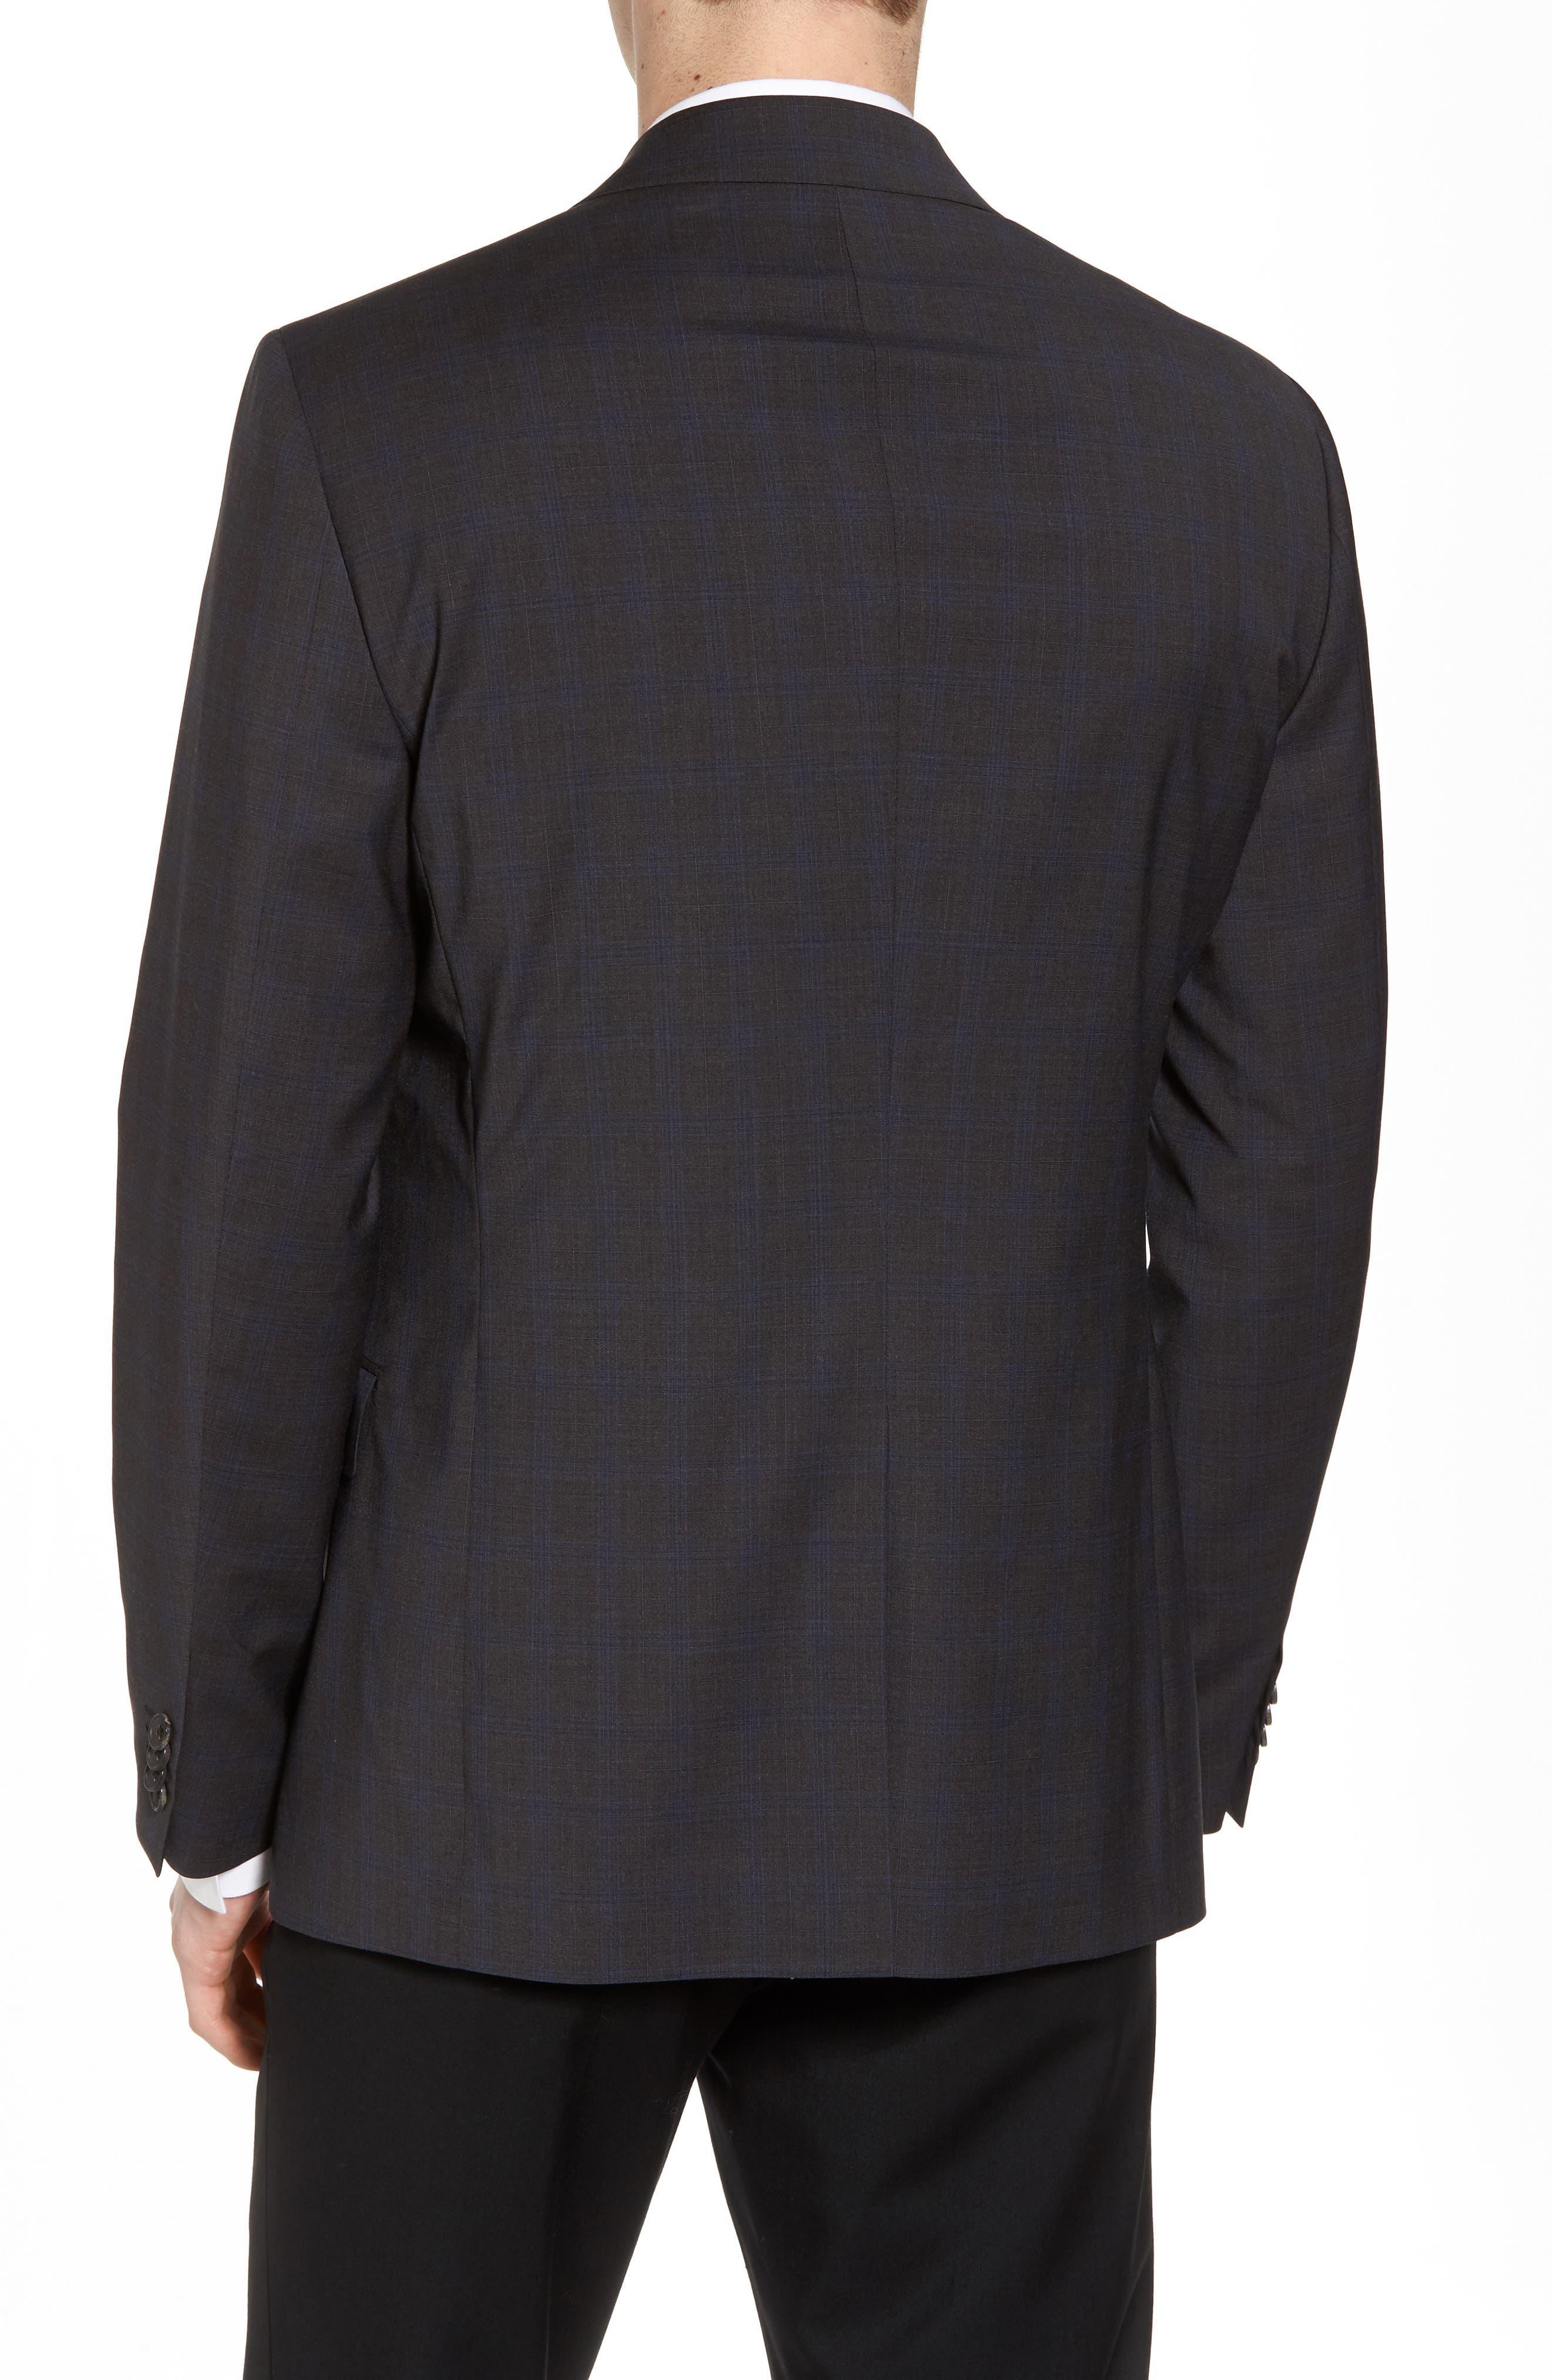 Wellar Grey Blue Plaid Sport Coat,                             Alternate thumbnail 2, color,                             043